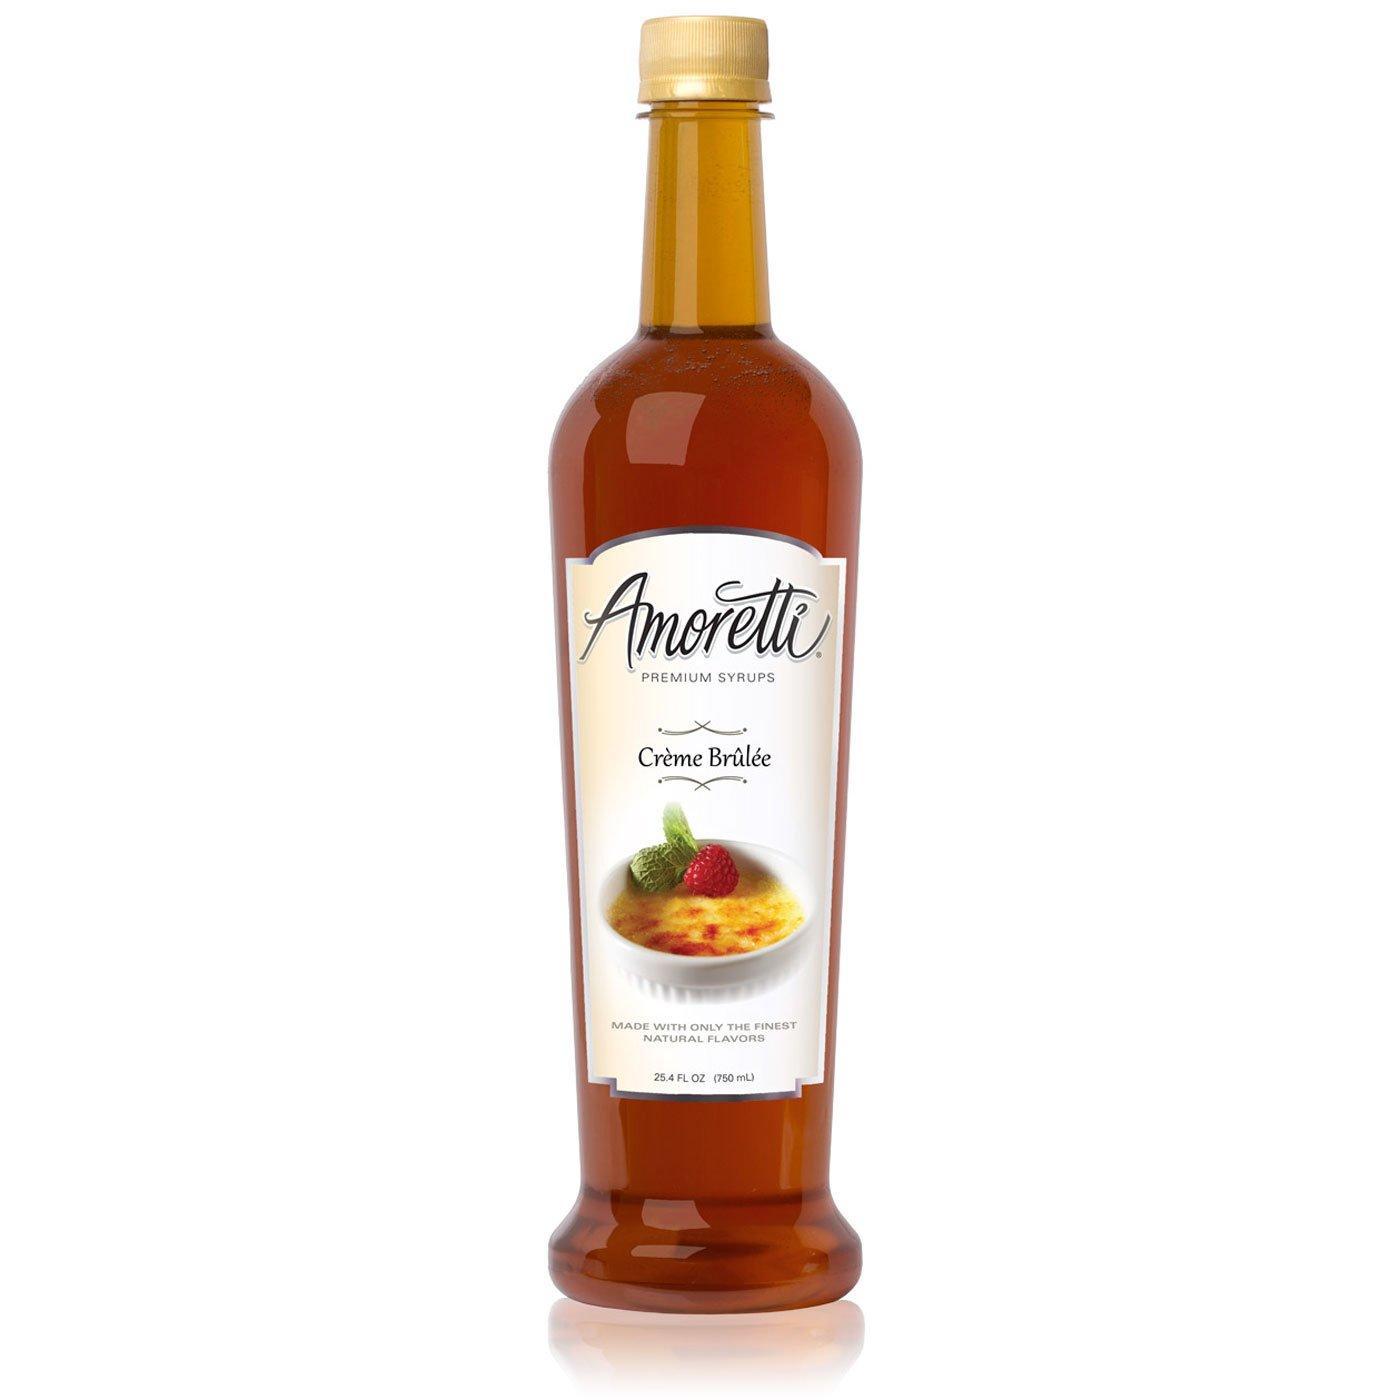 Amoretti Premium Syrup, Creme Brulee, 25.4 Ounce